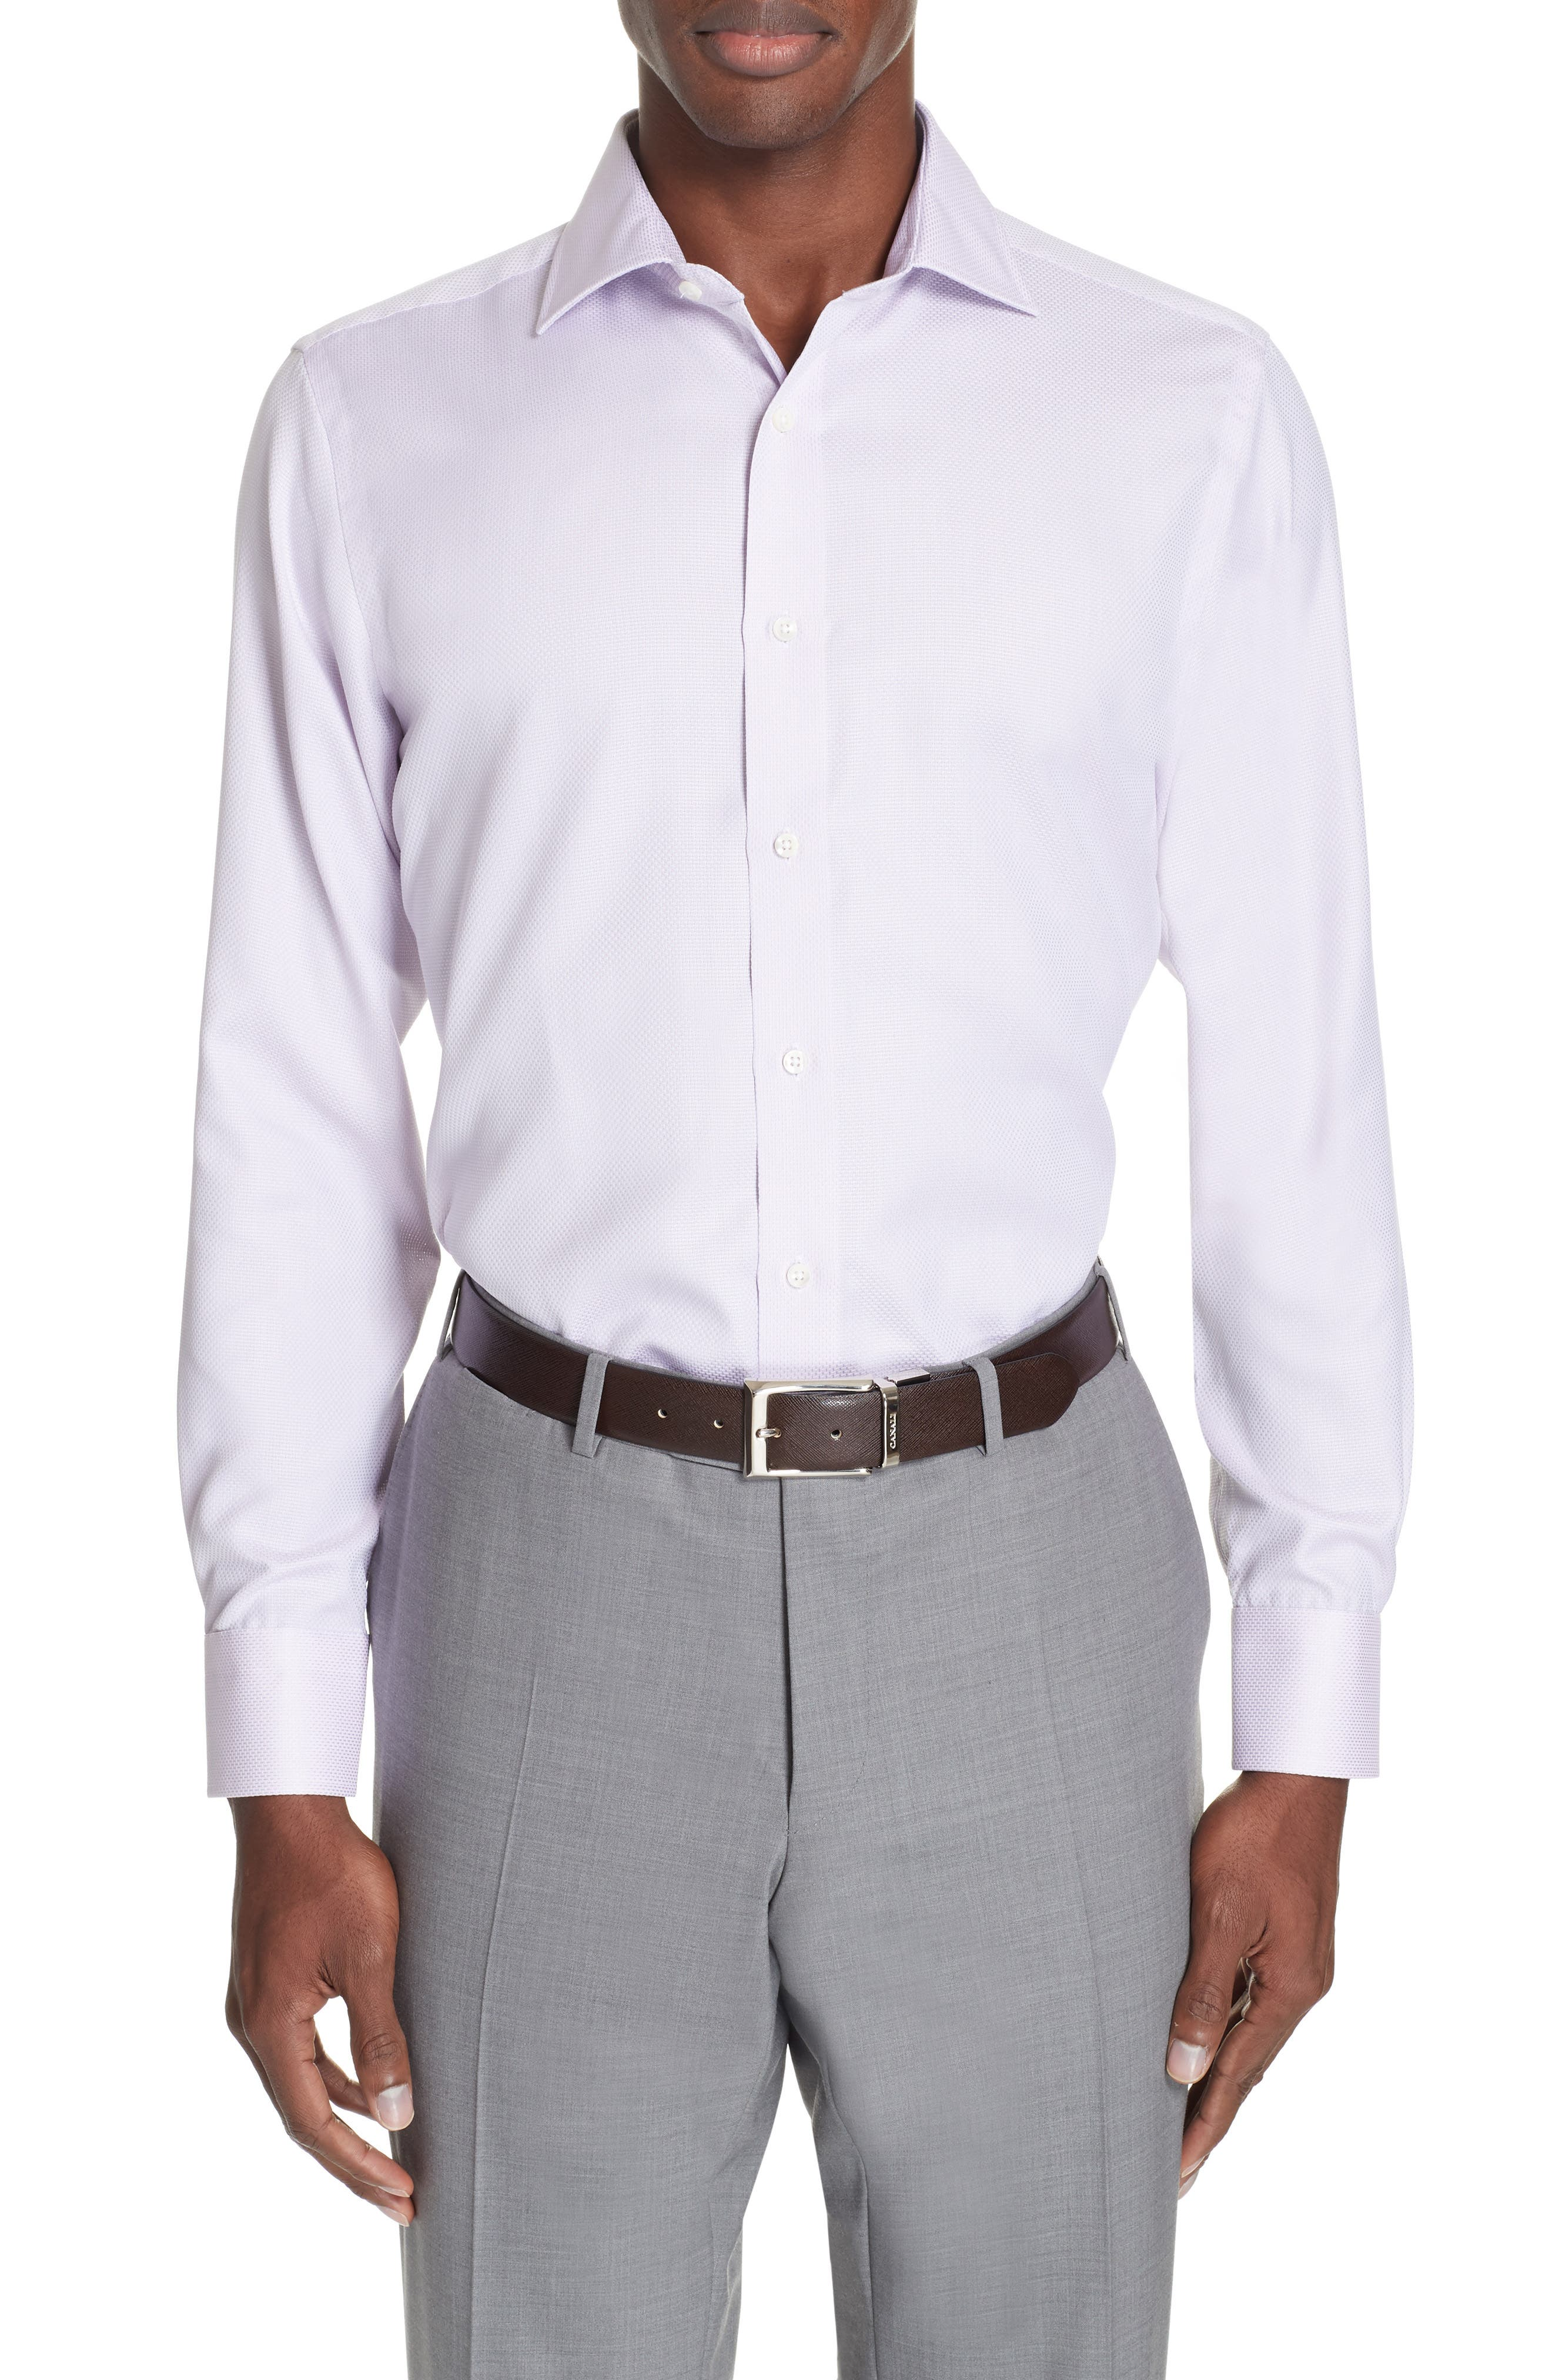 Trim Fit Solid Dress Shirt,                             Main thumbnail 1, color,                             LIGHT PINK